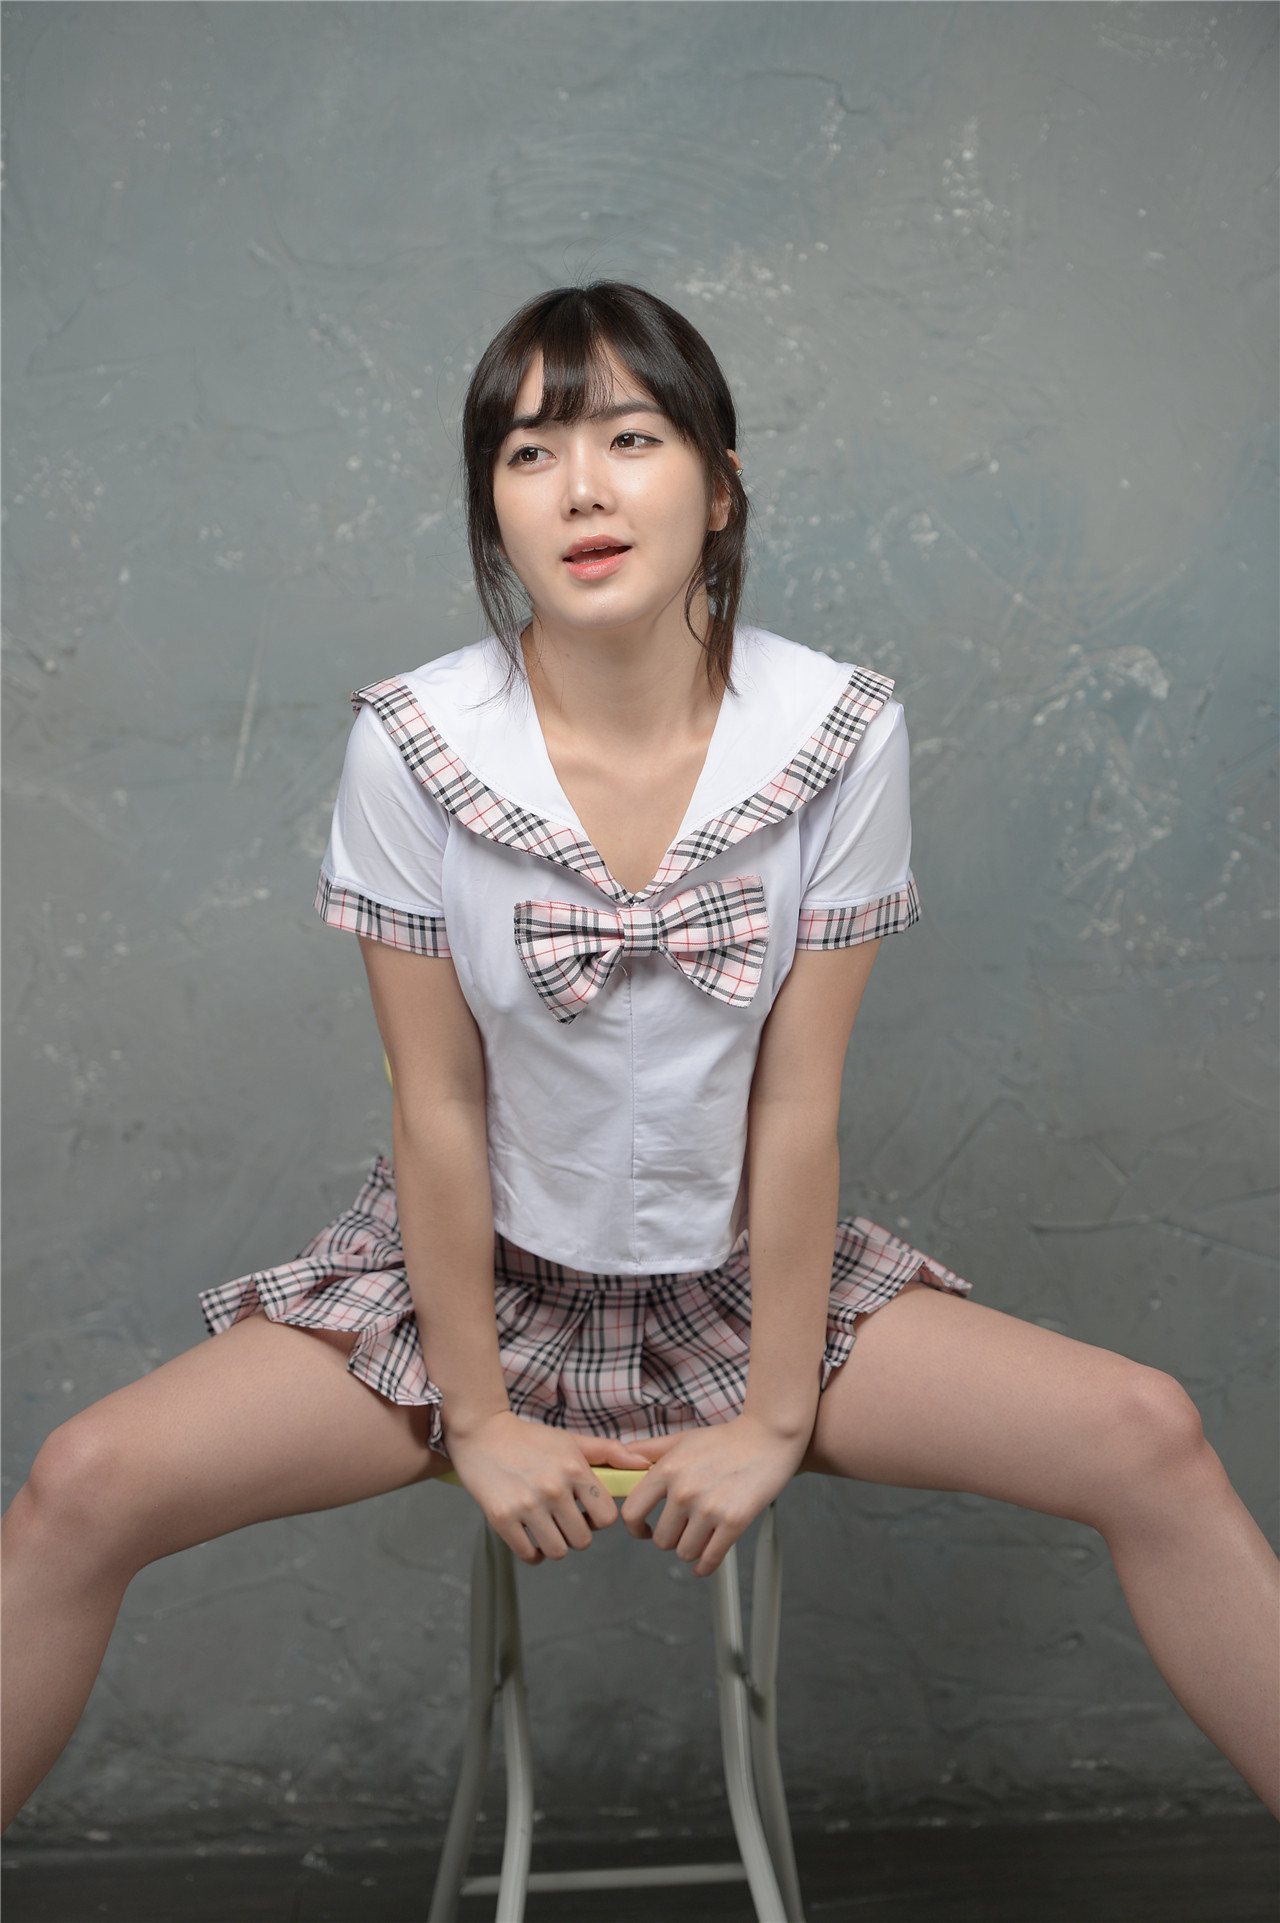 95G合集[南韩演艺圈大规模艳照门]嫩模艺人成名前全裸性感私拍外流 第5集 -5444P